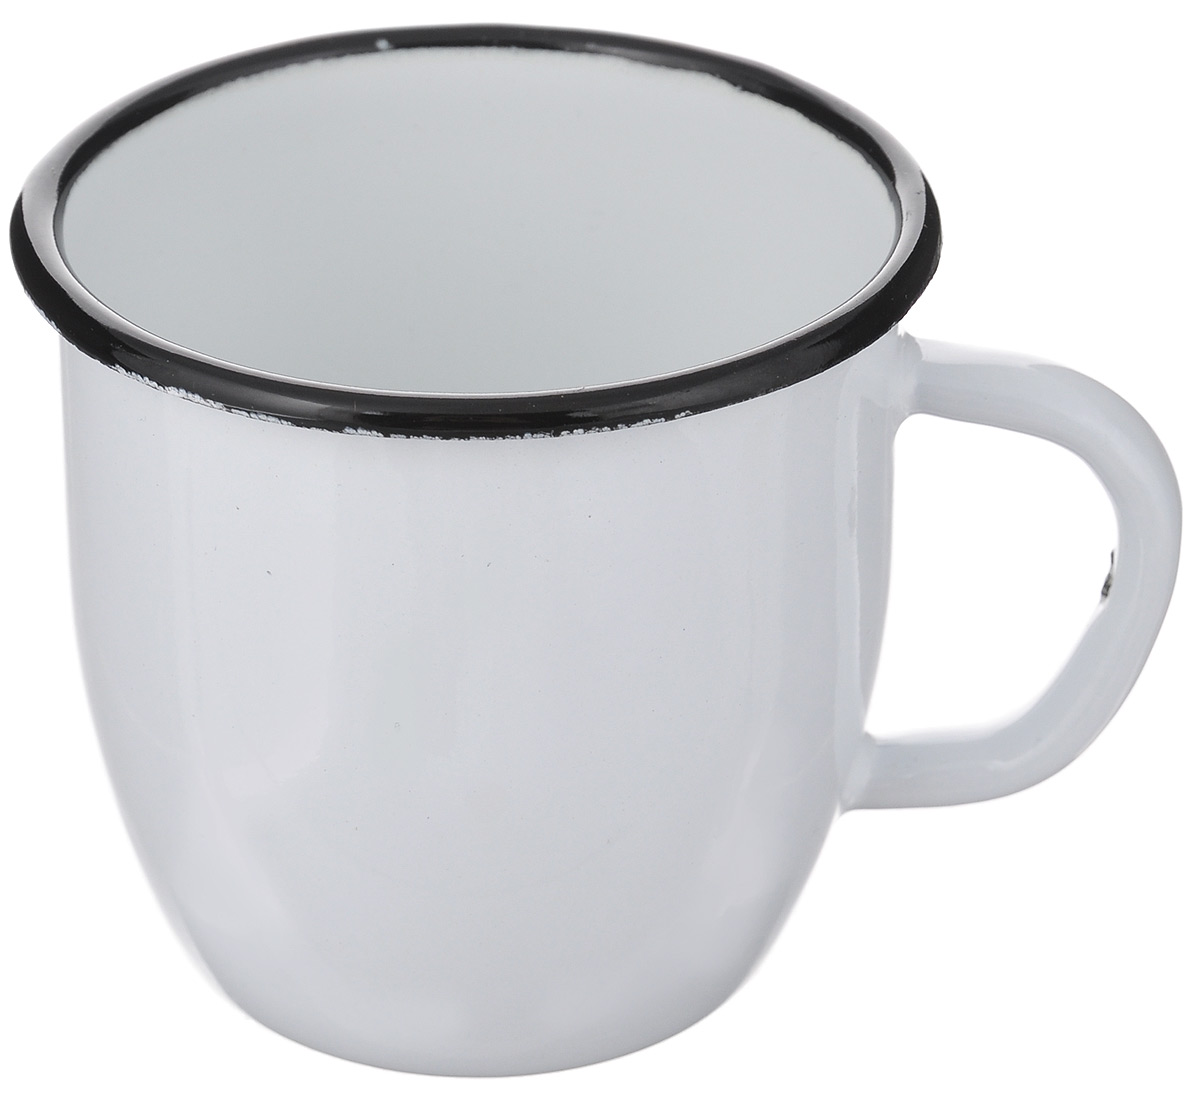 Кружка эмалированная АК ЛМЗ, цвет: белый, 250 мл ведро лмз 15л